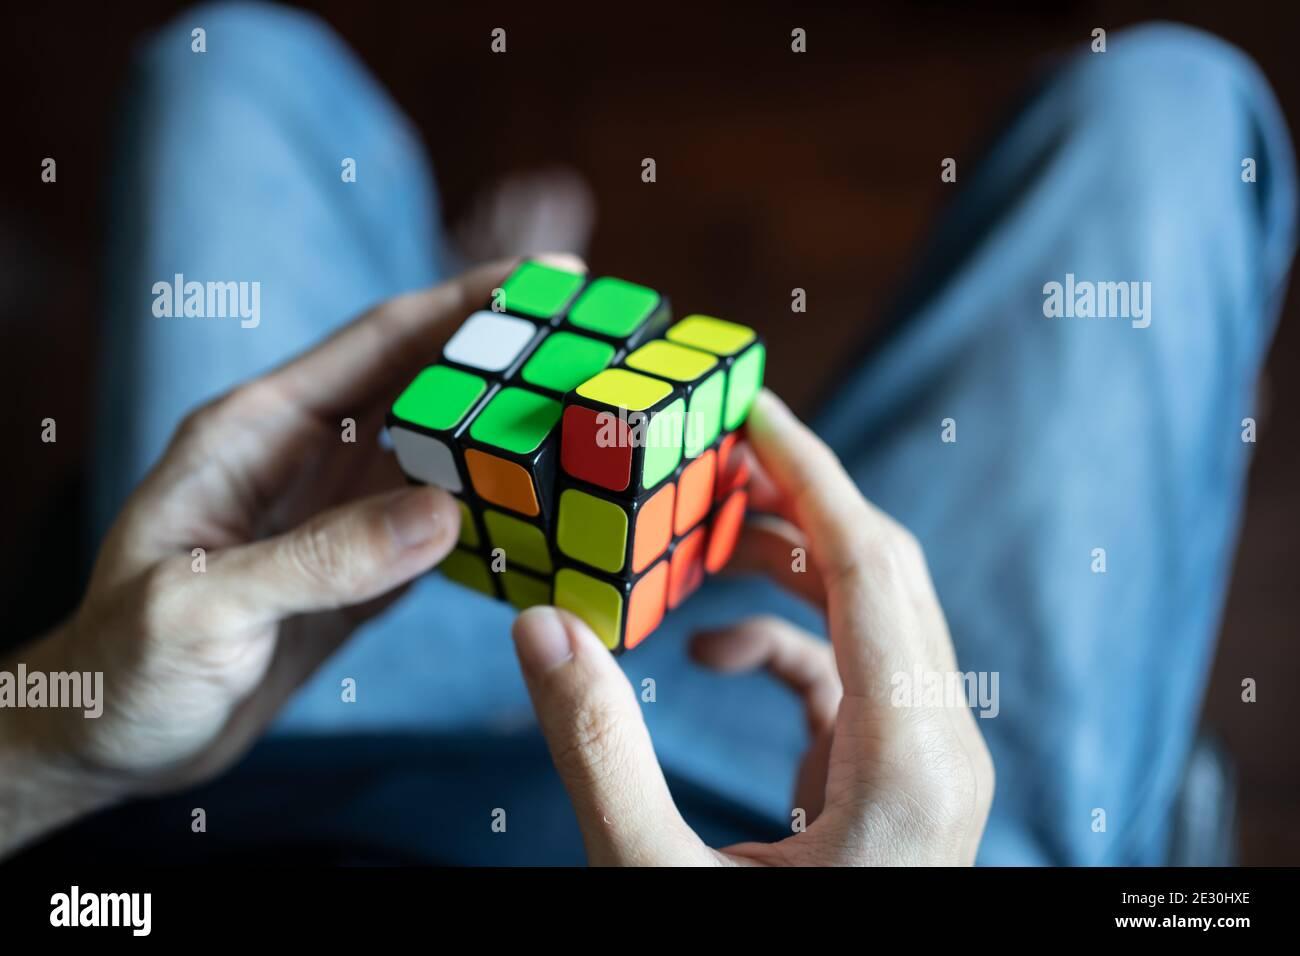 Bangkok, Thailand - January 13, 2021 : A man solving Rubik's cube. Stock Photo